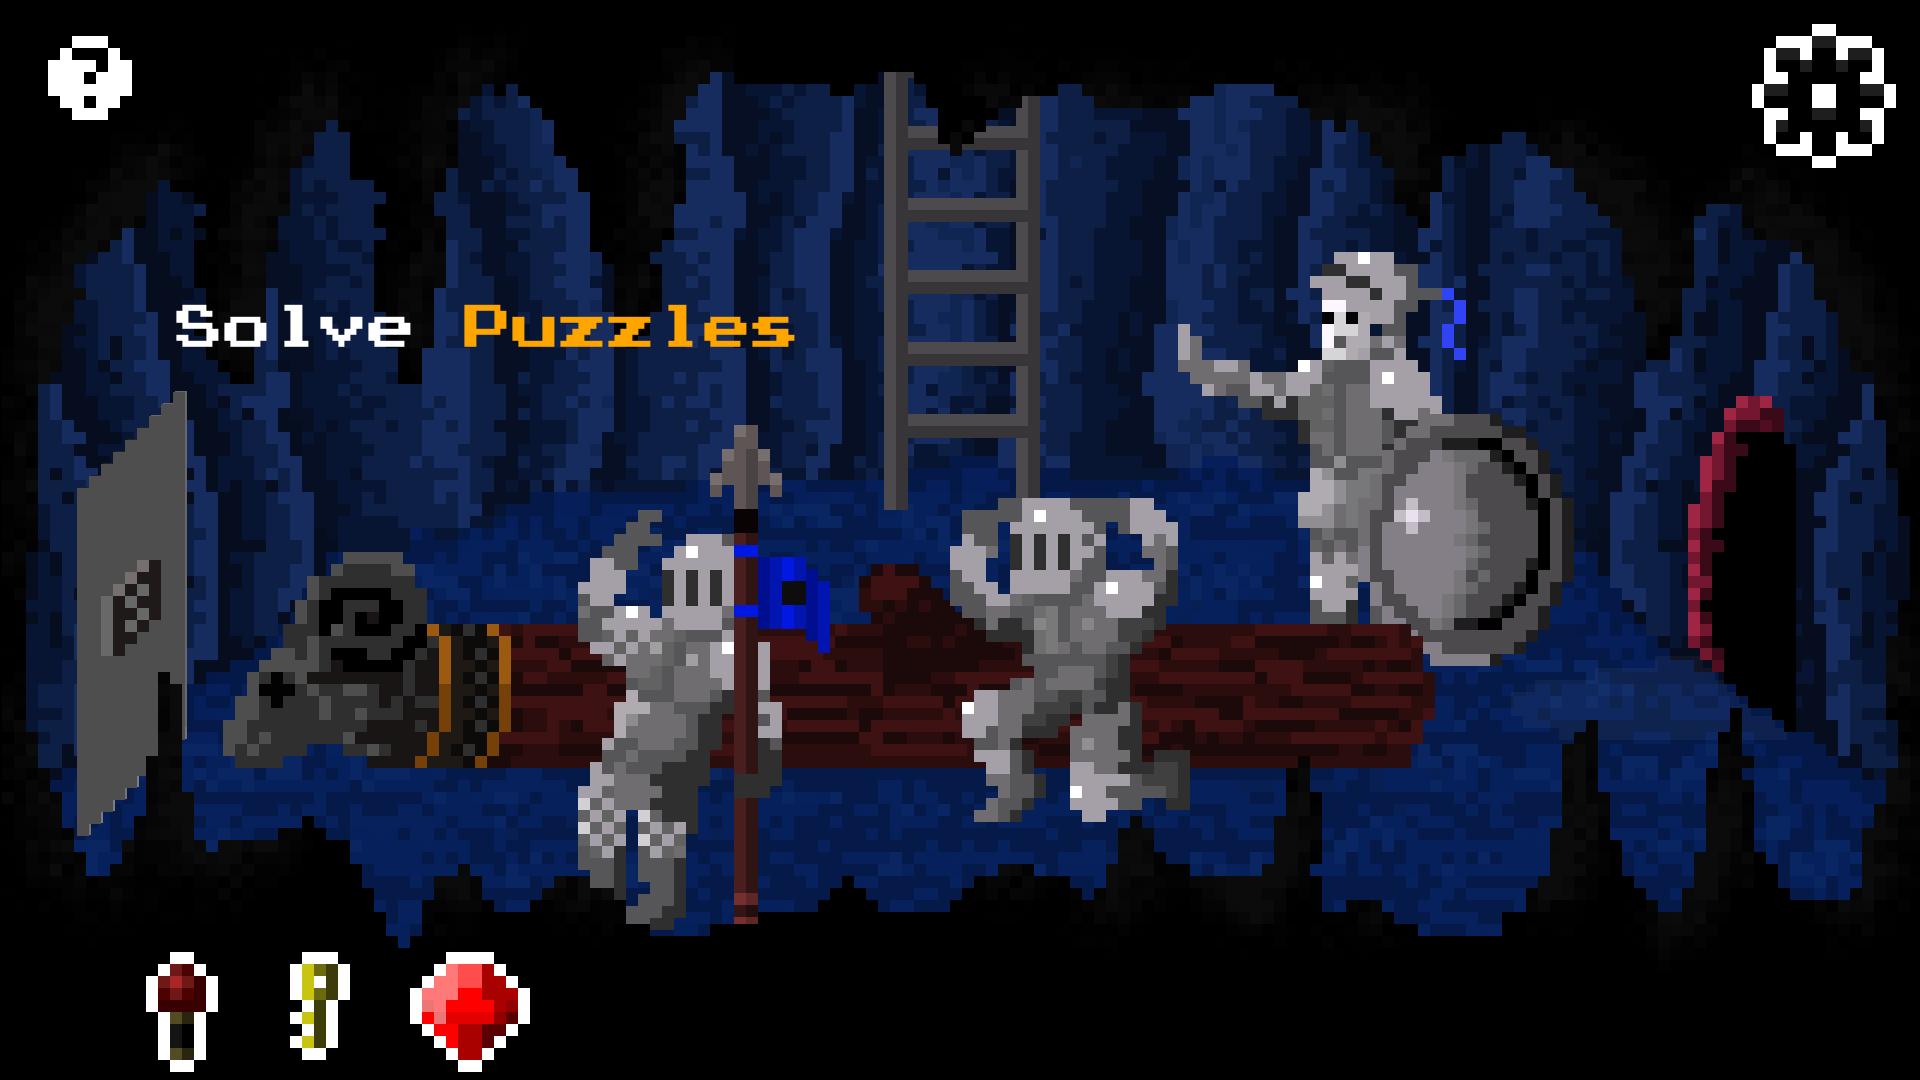 2_Puzzles